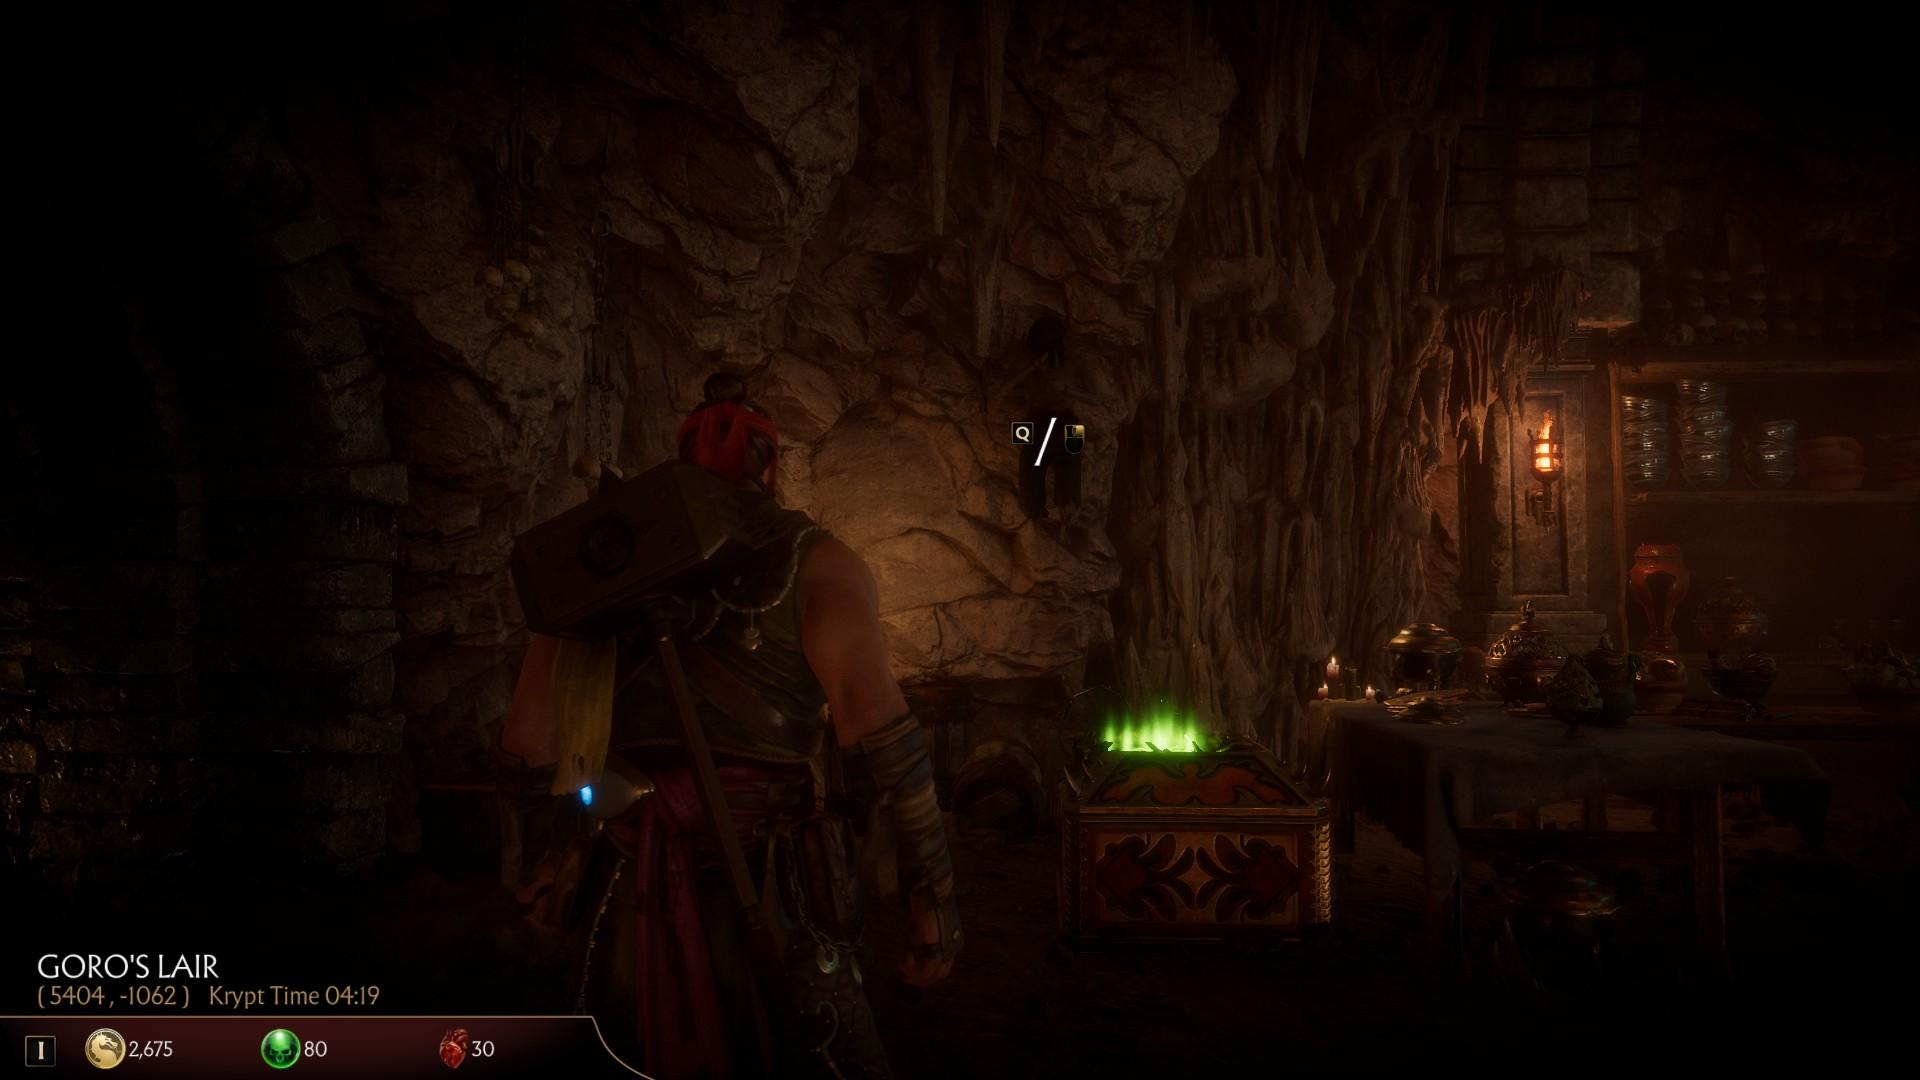 Mortal Kombat 11 farming – farming hearts, koins, and soul